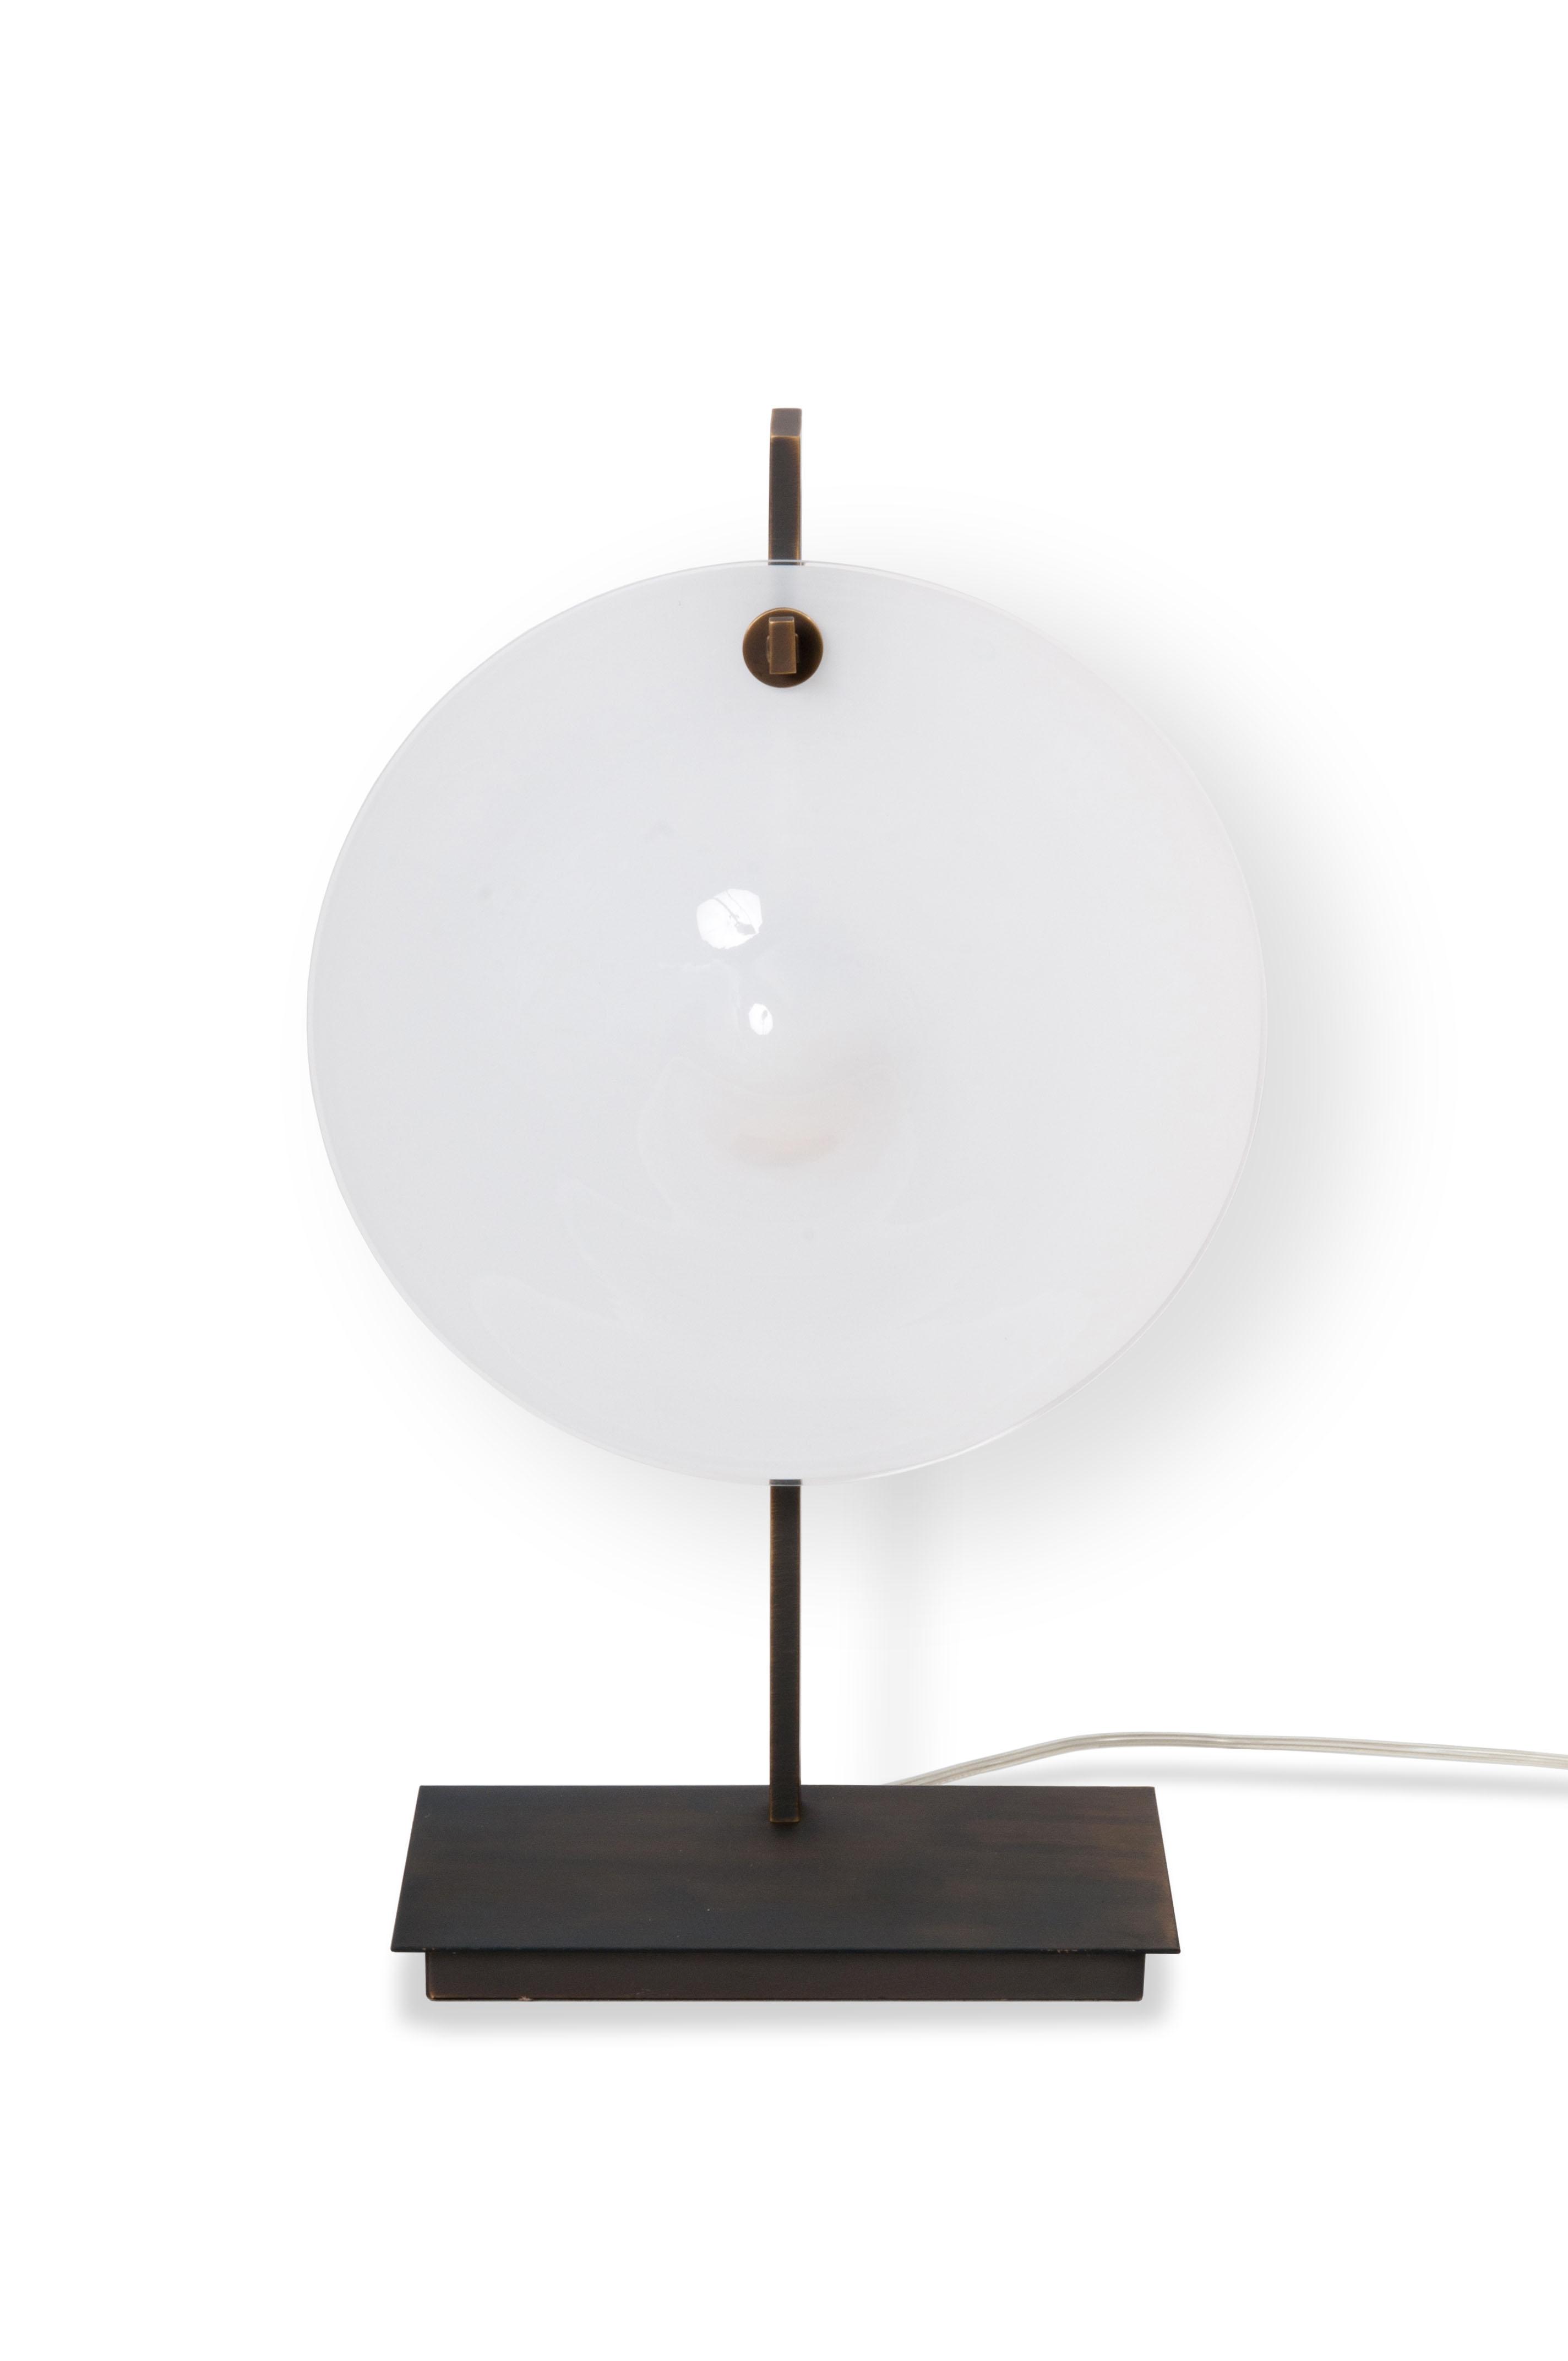 orbe-table-bronze-soie-silk-patrick-naggar-veronese-1.jpg